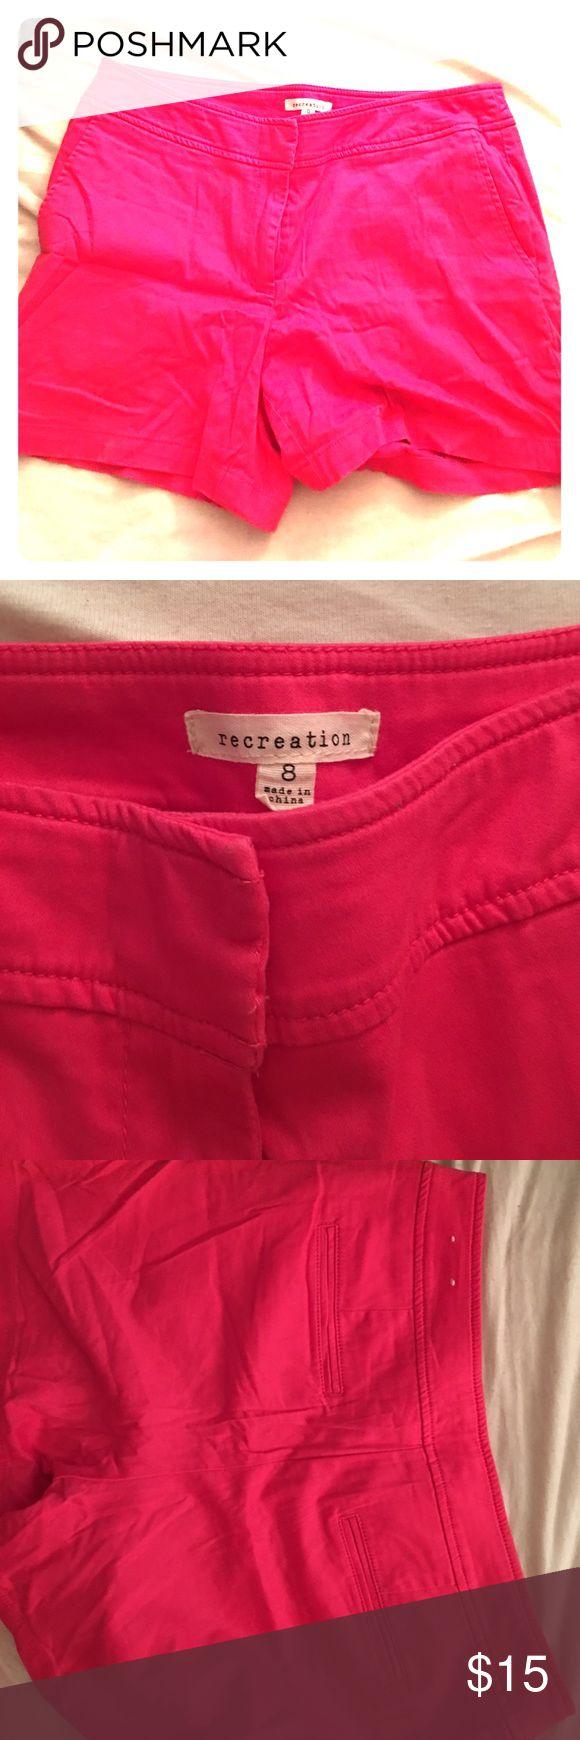 Hot pink shorts Hot pink shorts Shorts Bermudas